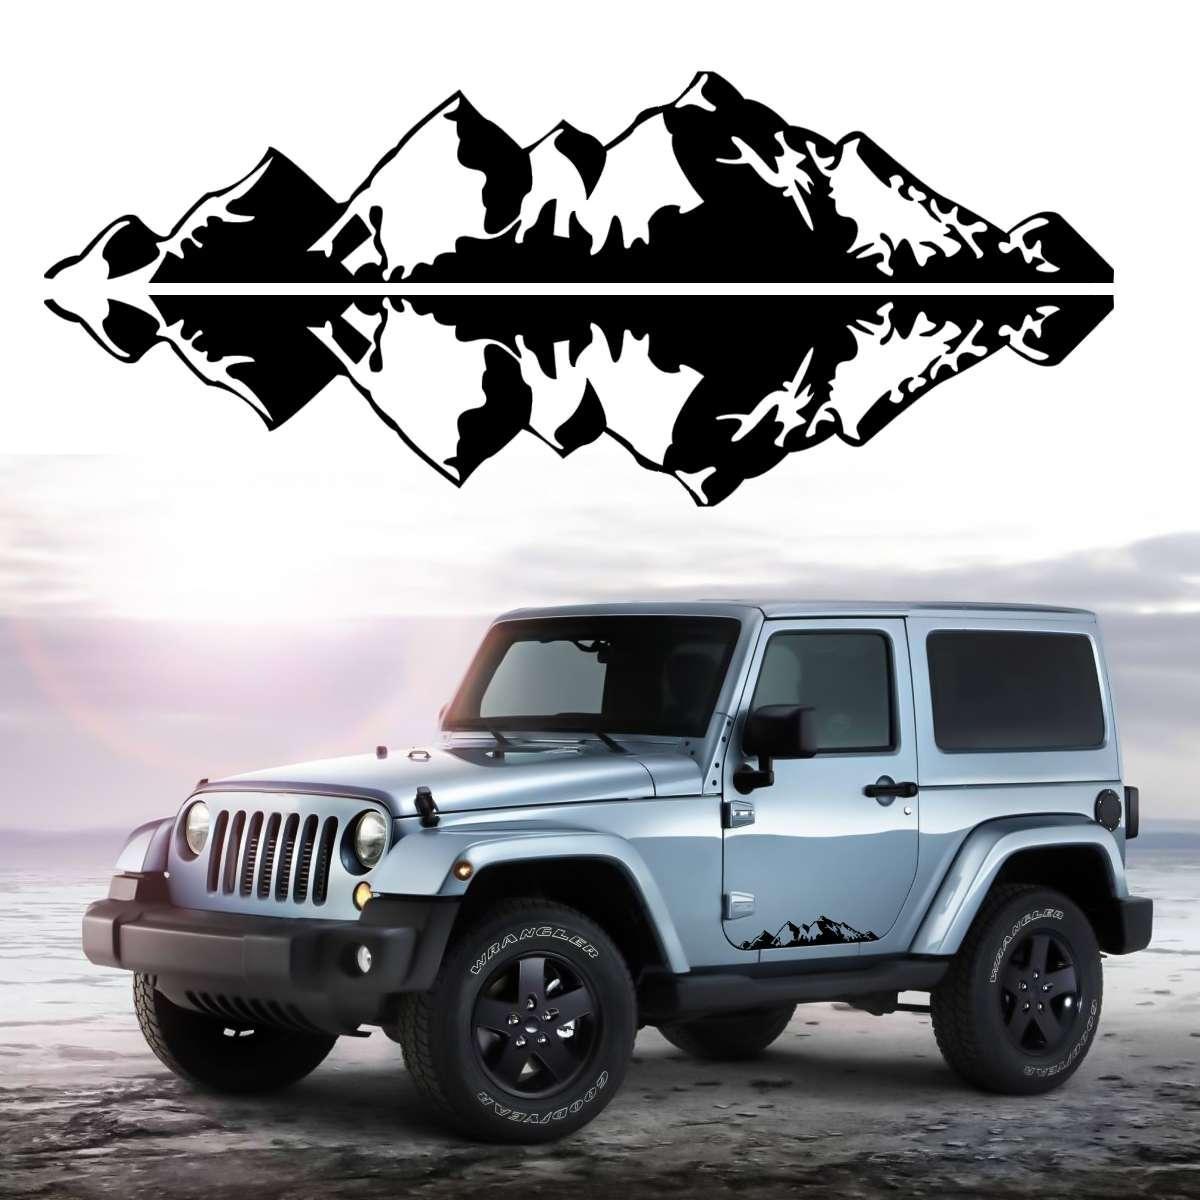 1 pair العالمي سيارة جبل سلسلة ملصق الفينيل الشارات ملصق ل جيب suv شاحنة 76x16.8 سنتيمتر 30 x 6.6 أبيض أسود